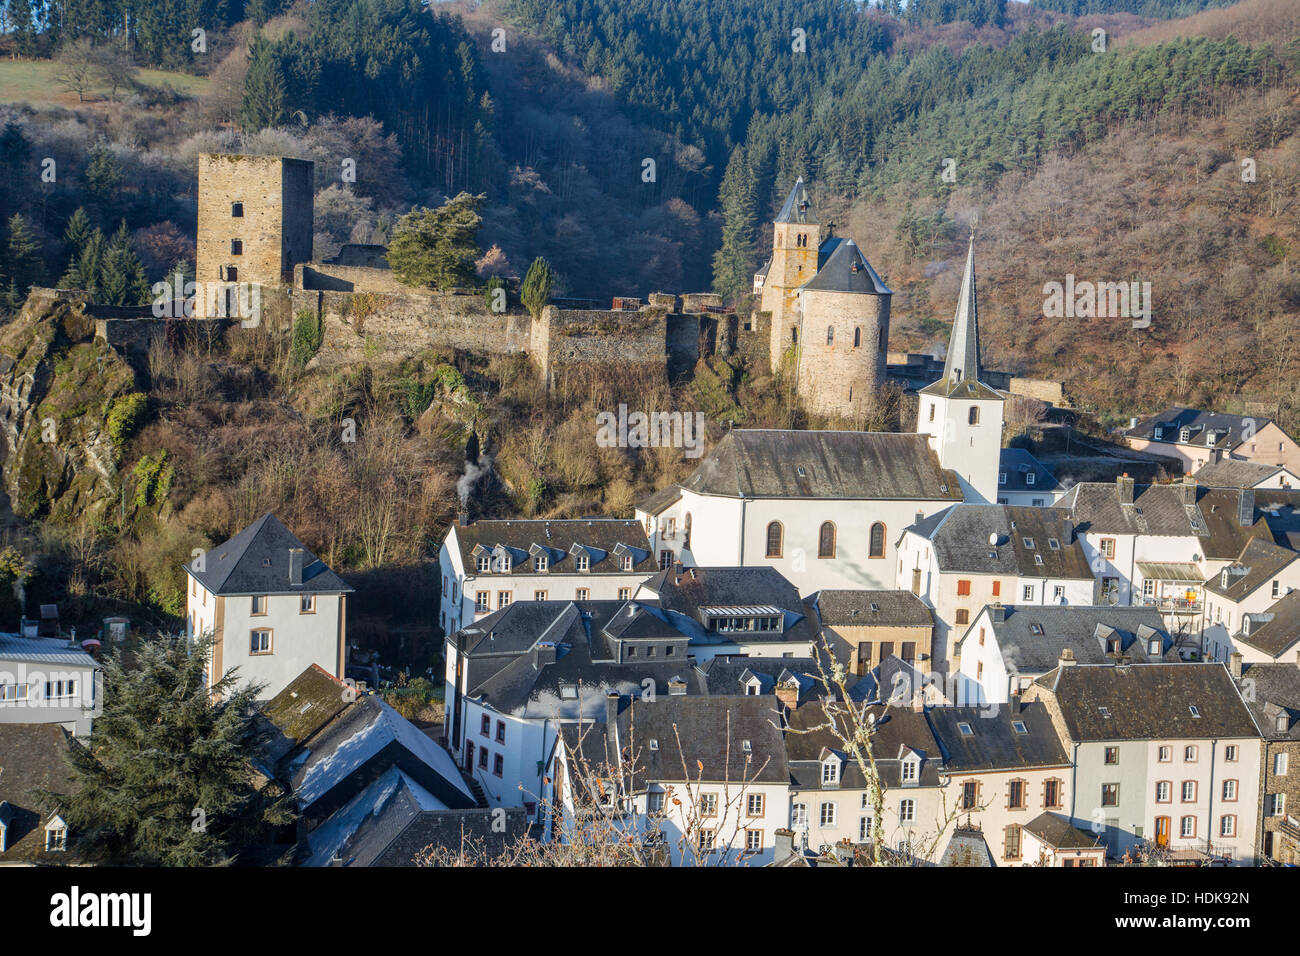 Esch-sur-Sûre Photo Stock